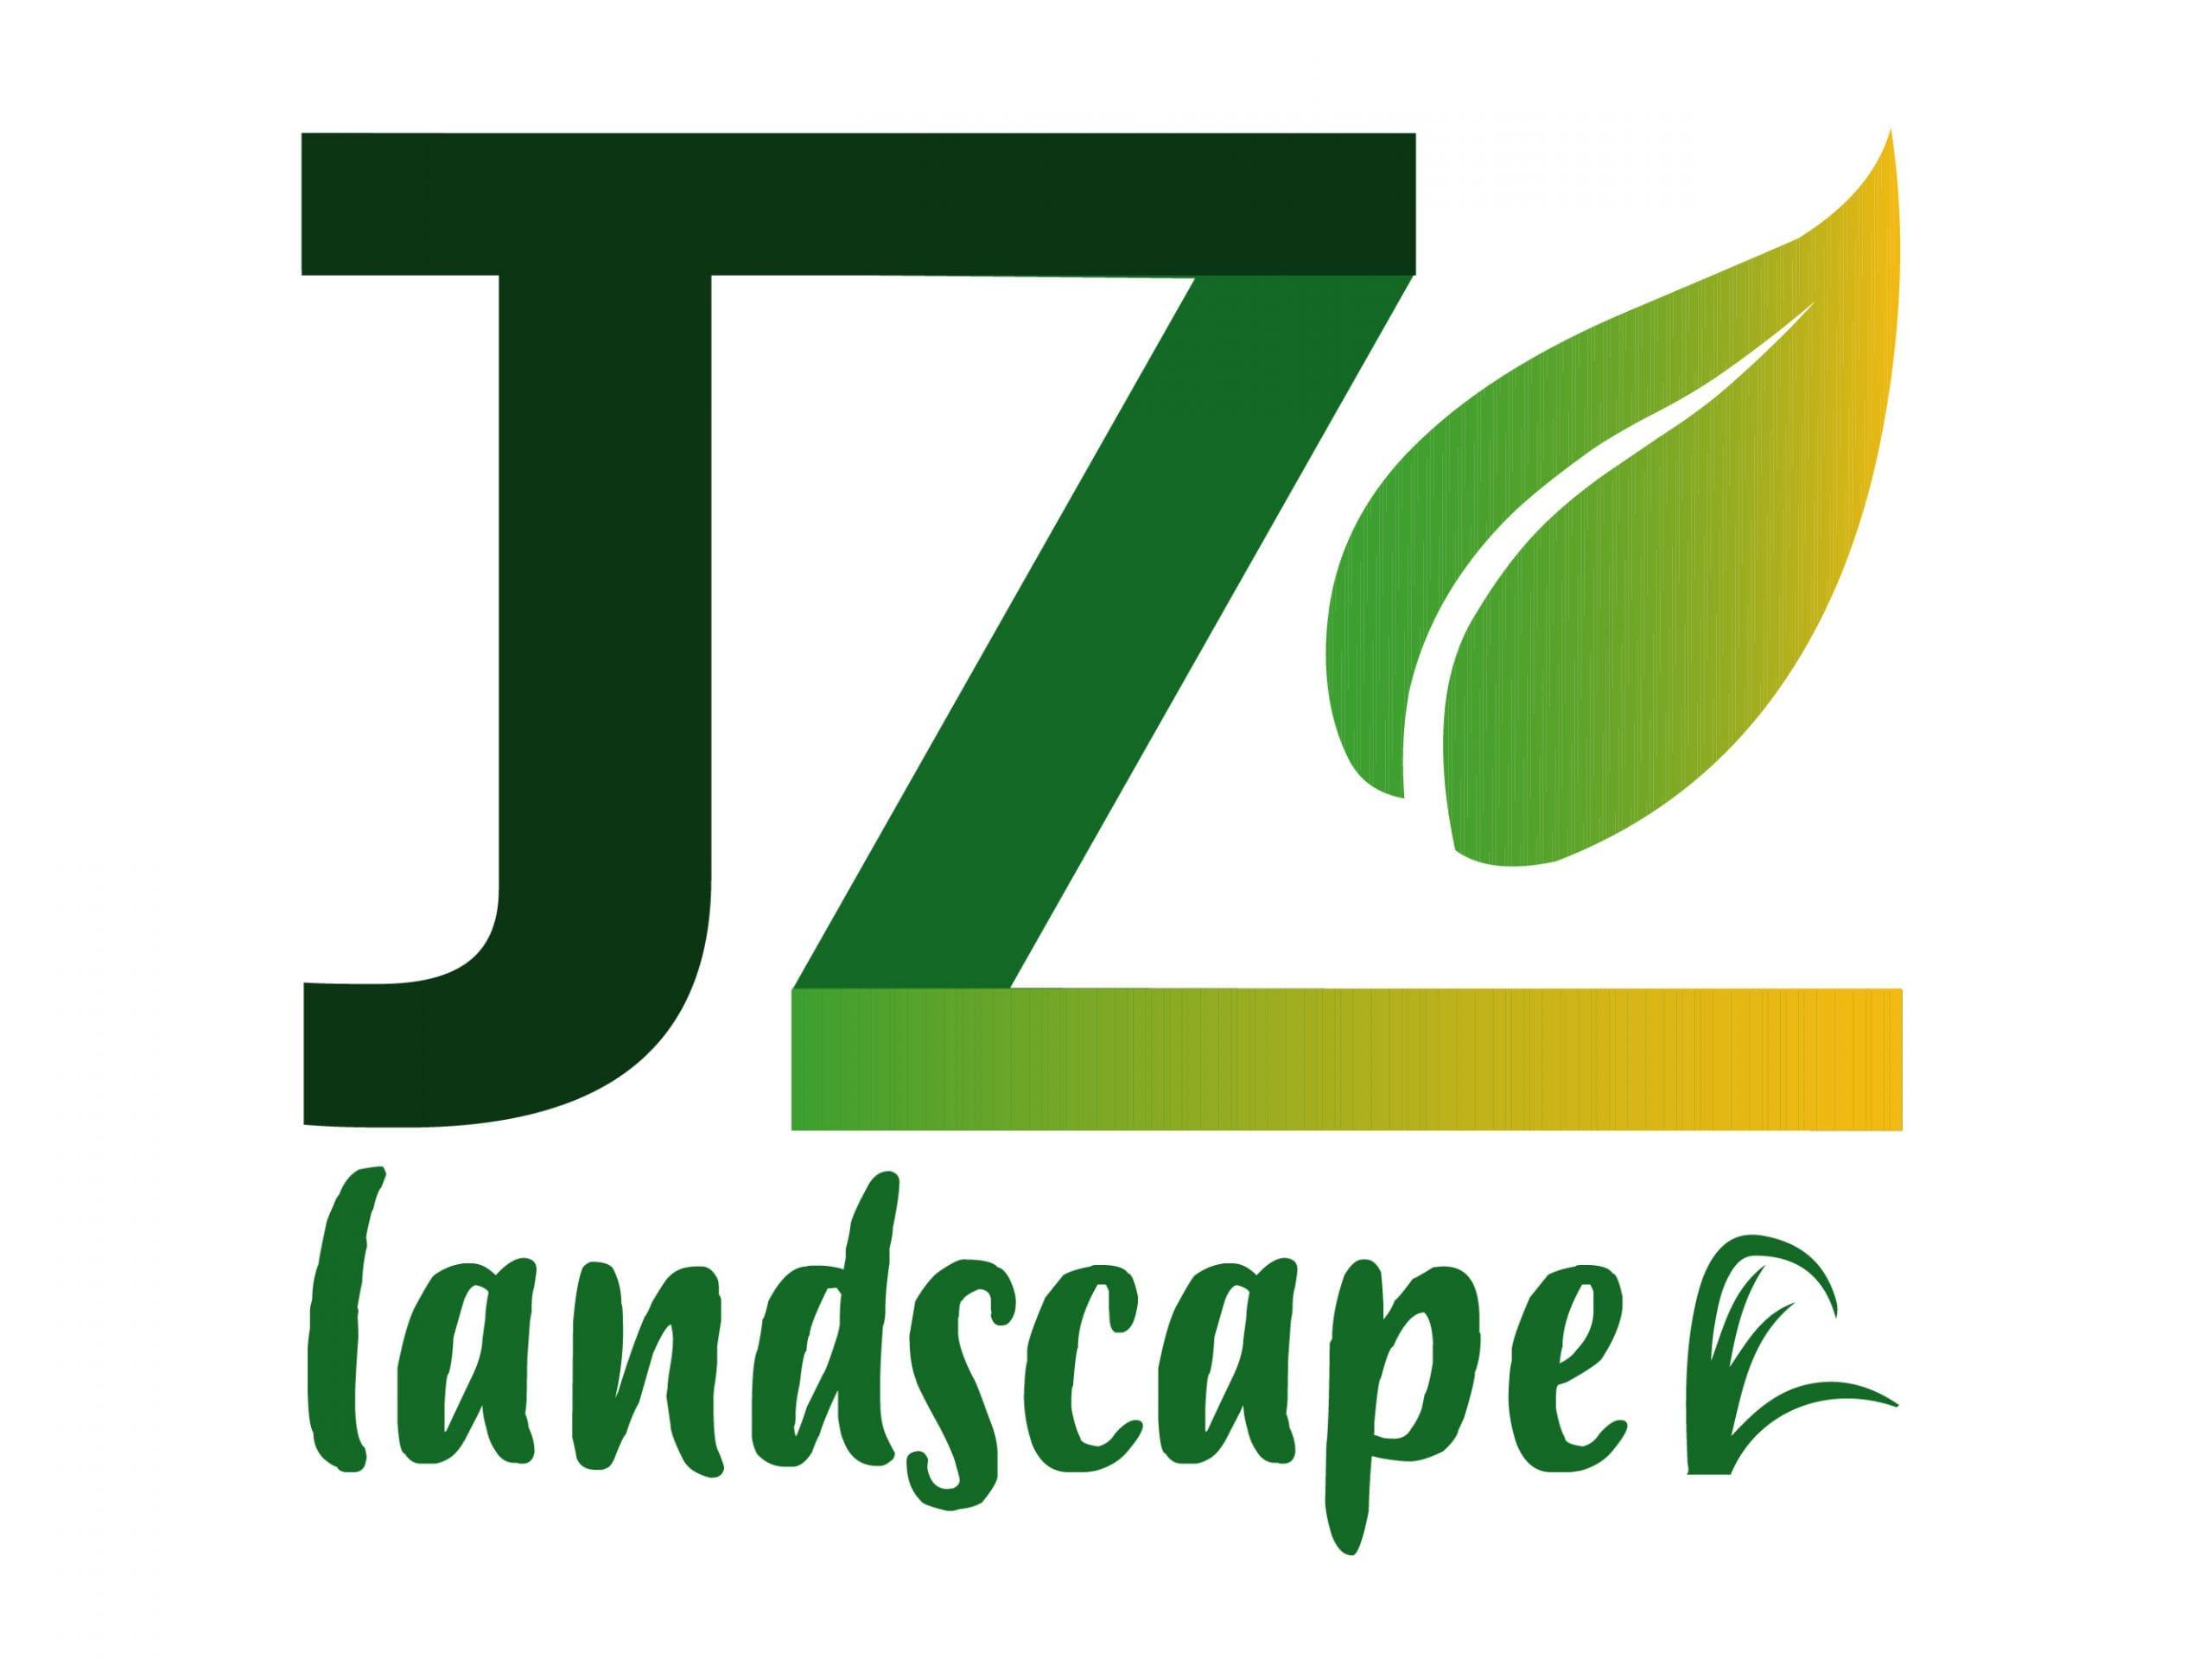 JZ Landscape | JZ Landscape